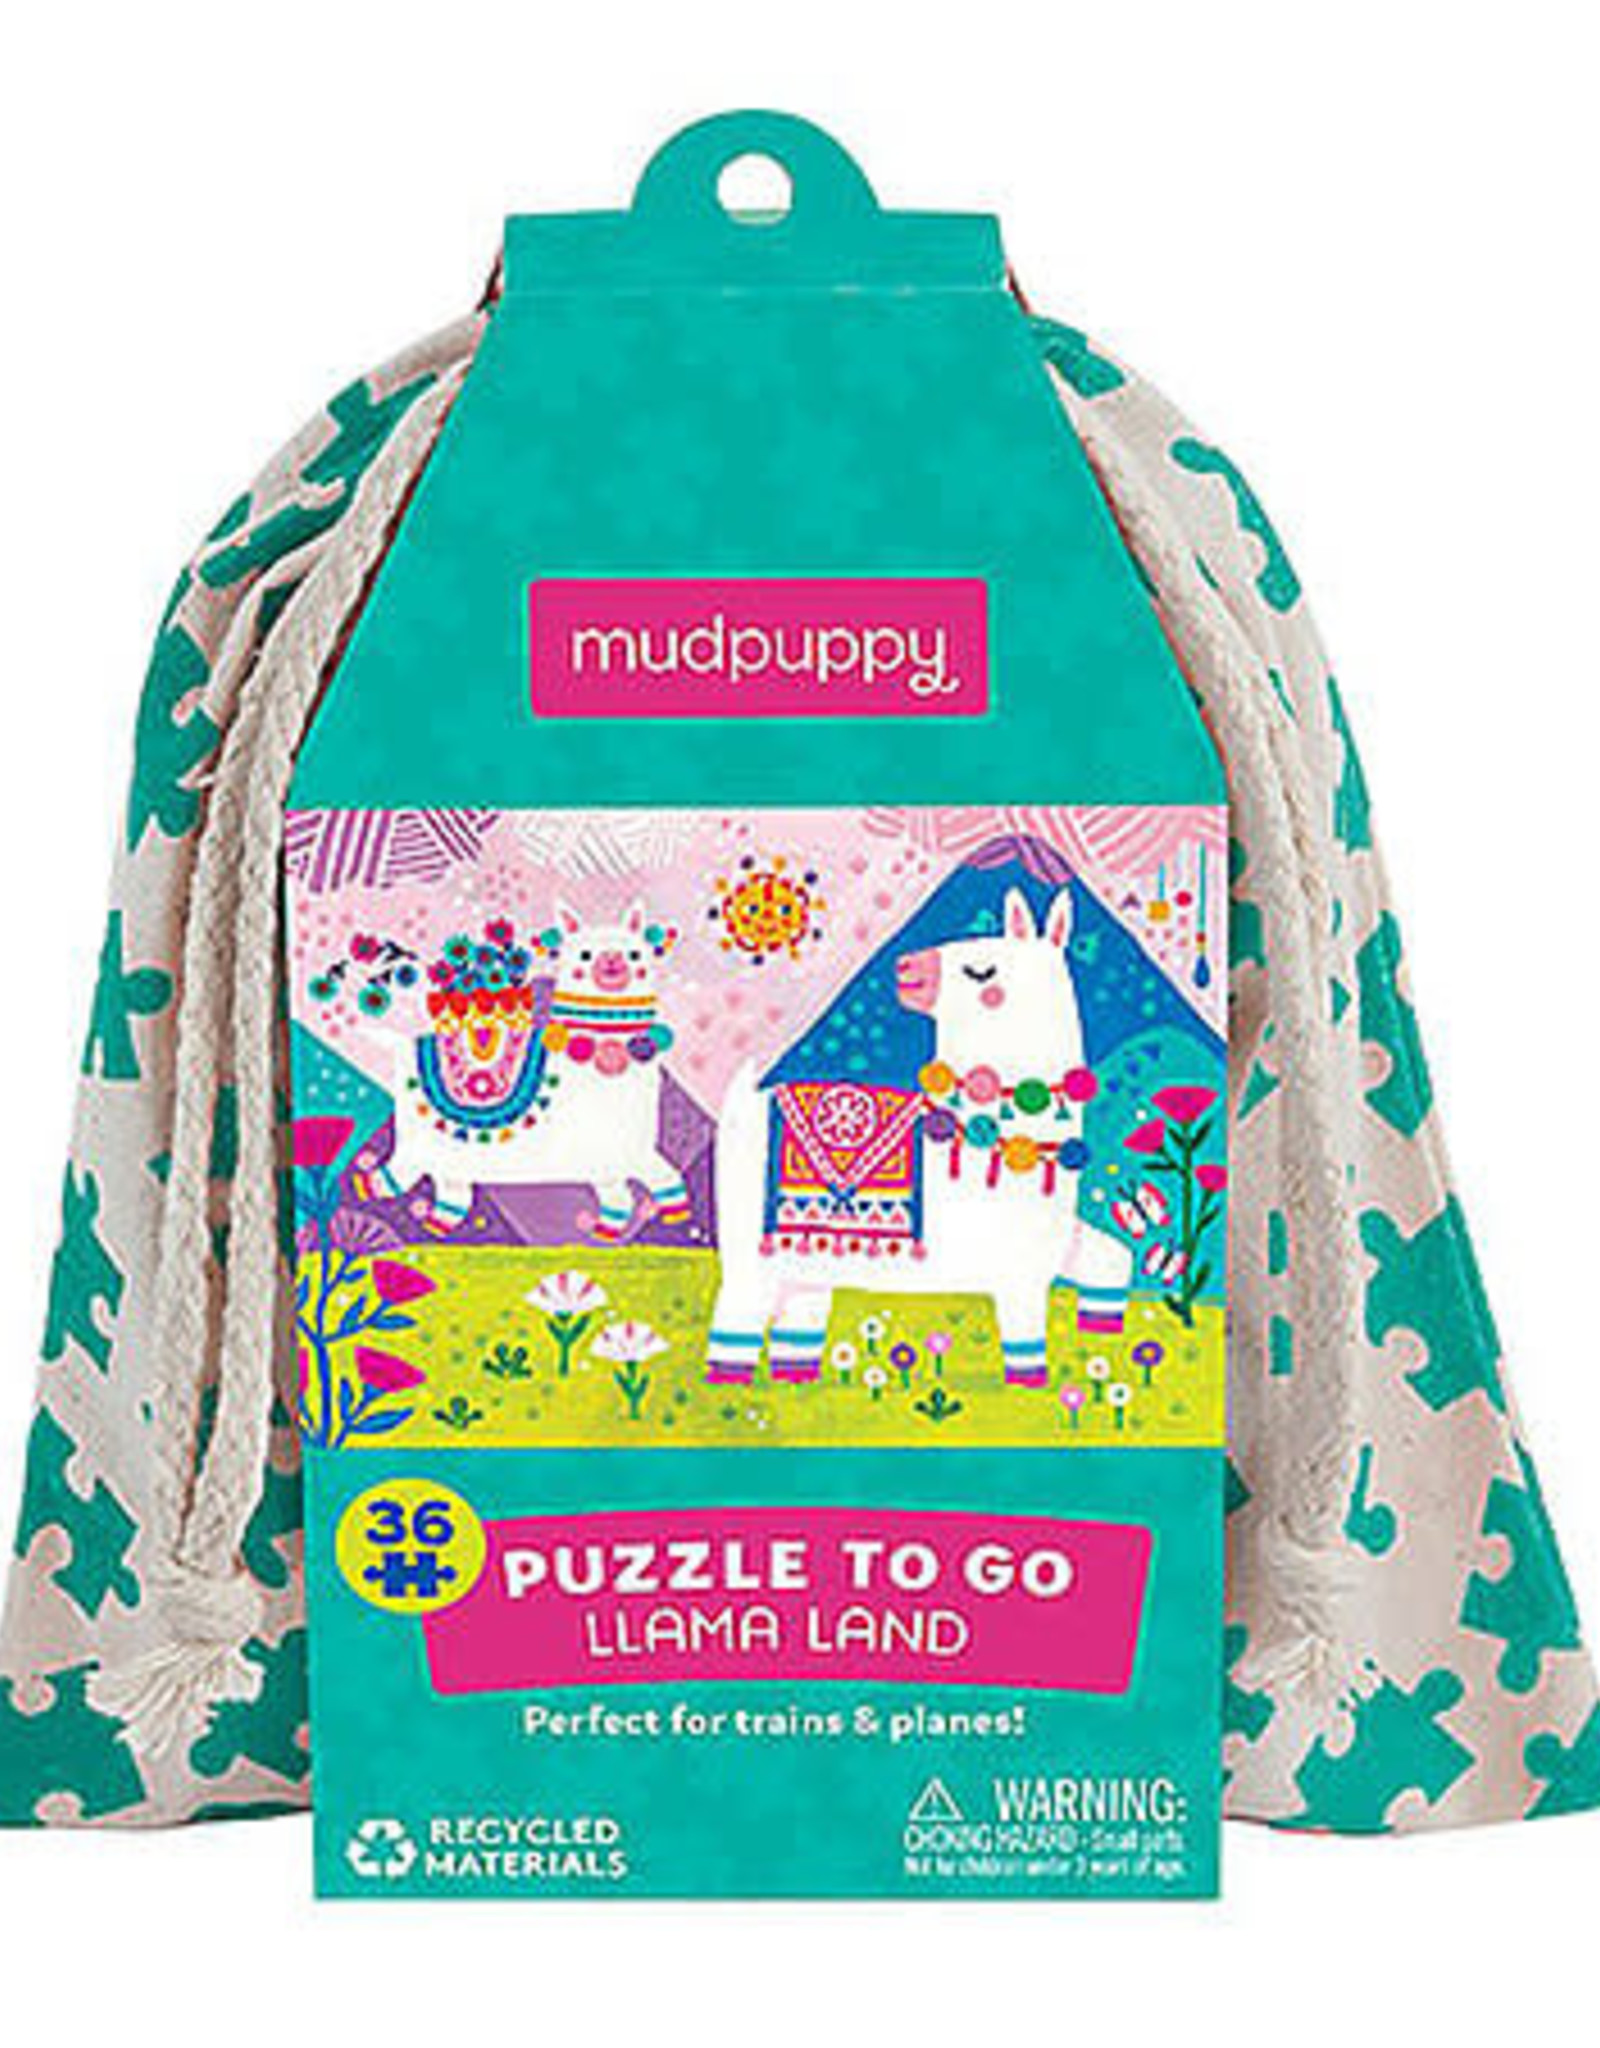 Mudpuppy Puzzle To Go